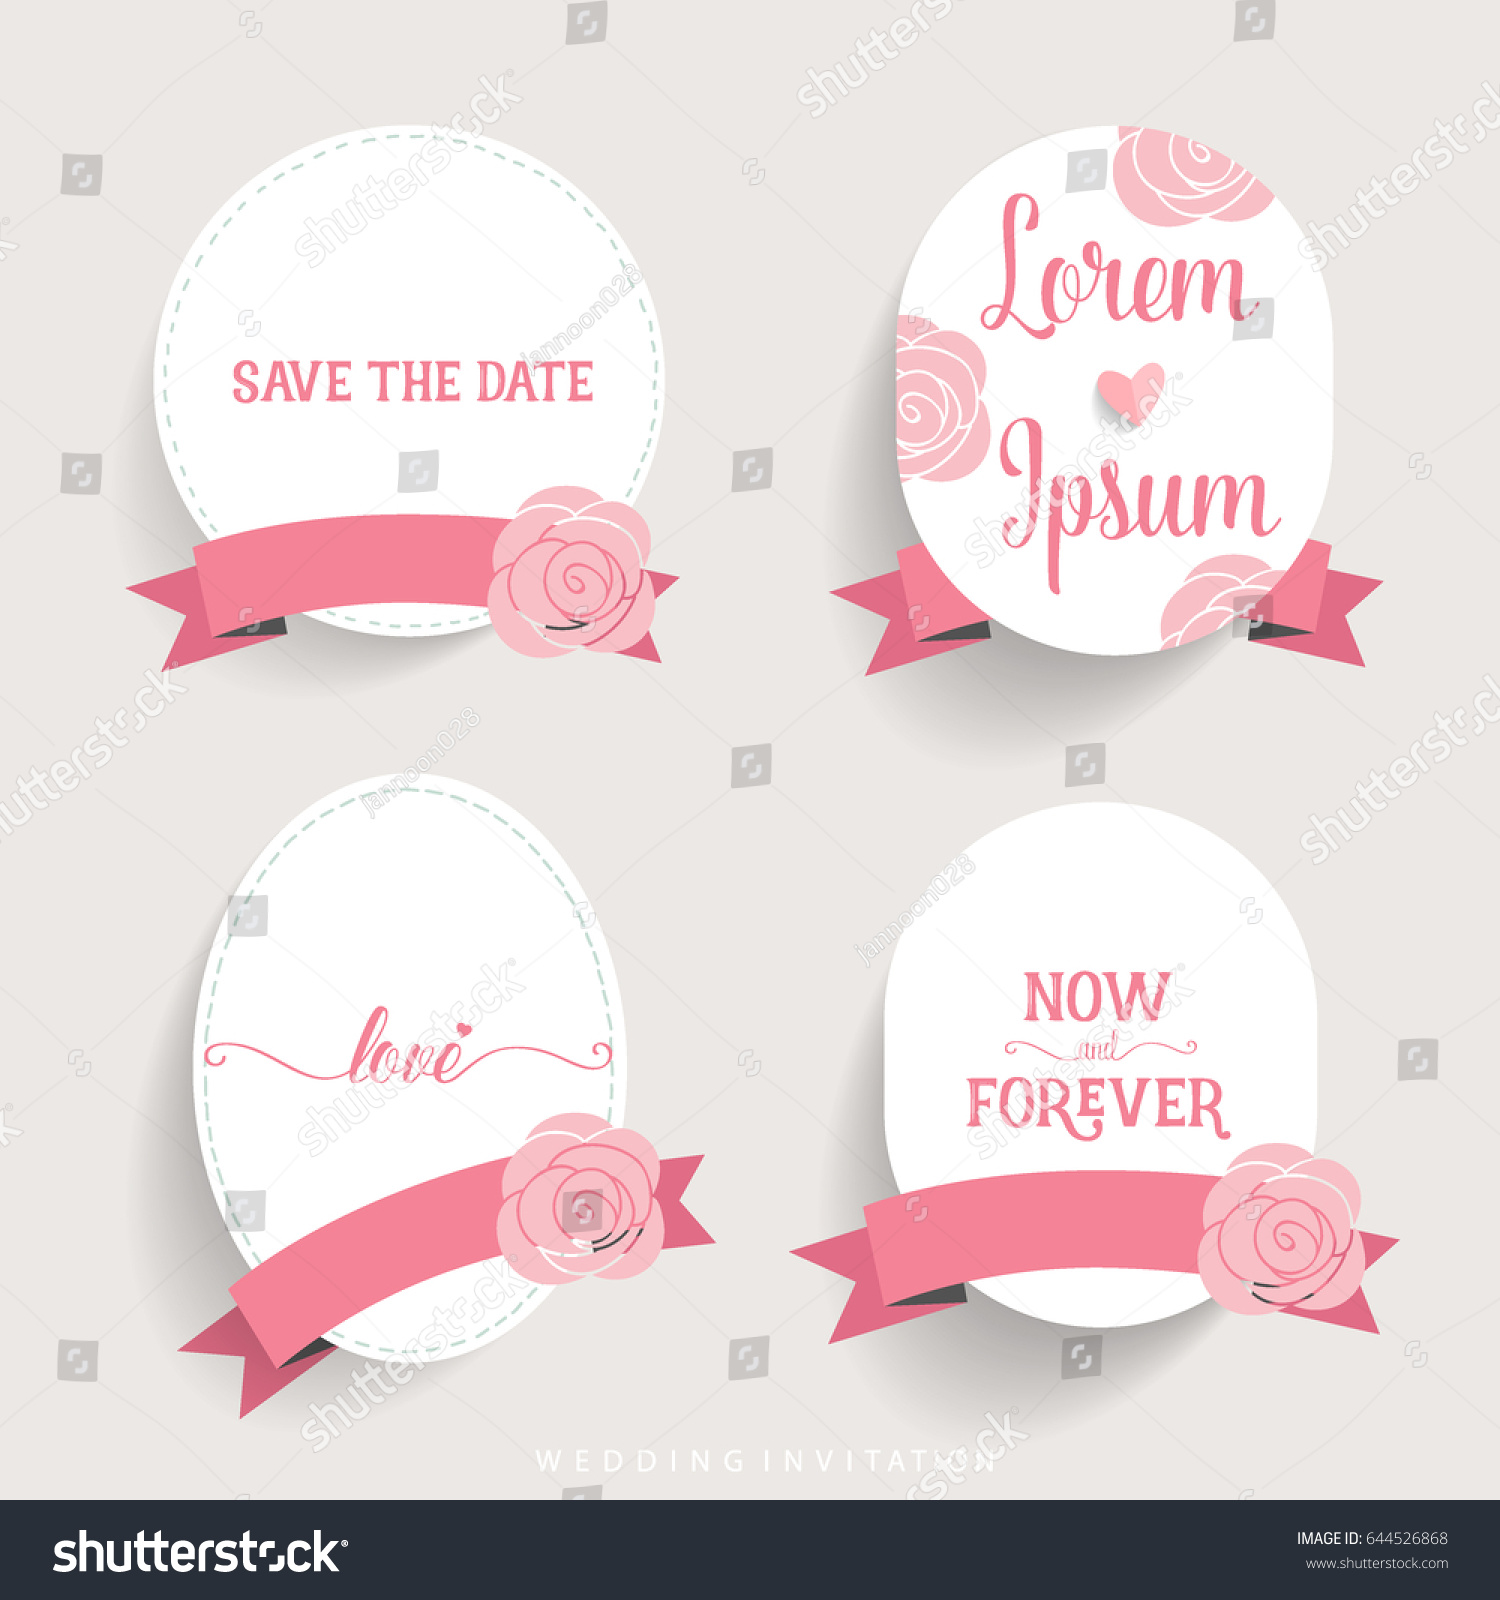 Wedding Invitation Card Design Cute Flower Stock Vector 644526868 ...